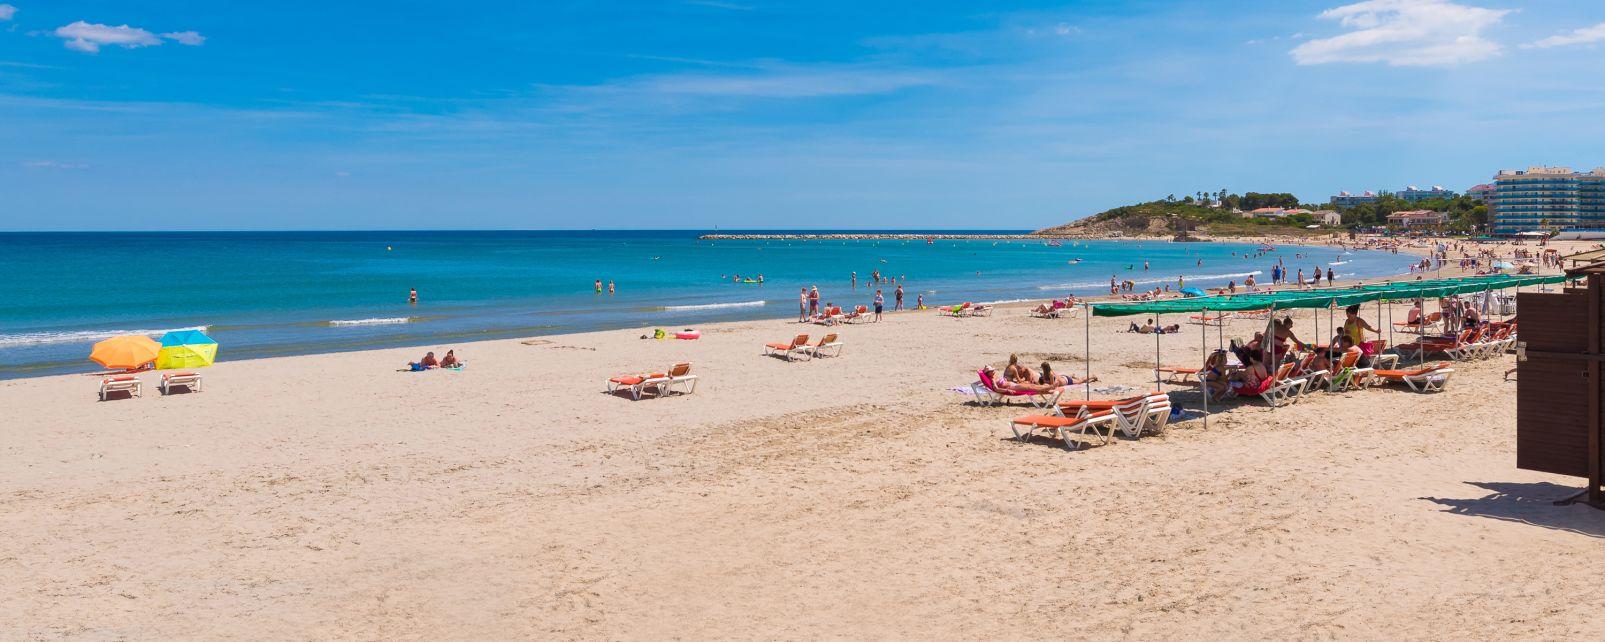 La Pineda, Catalogne, Espagne, Coastline Costa Dorada, beach in La Pineda, Tarragona, Catalunya